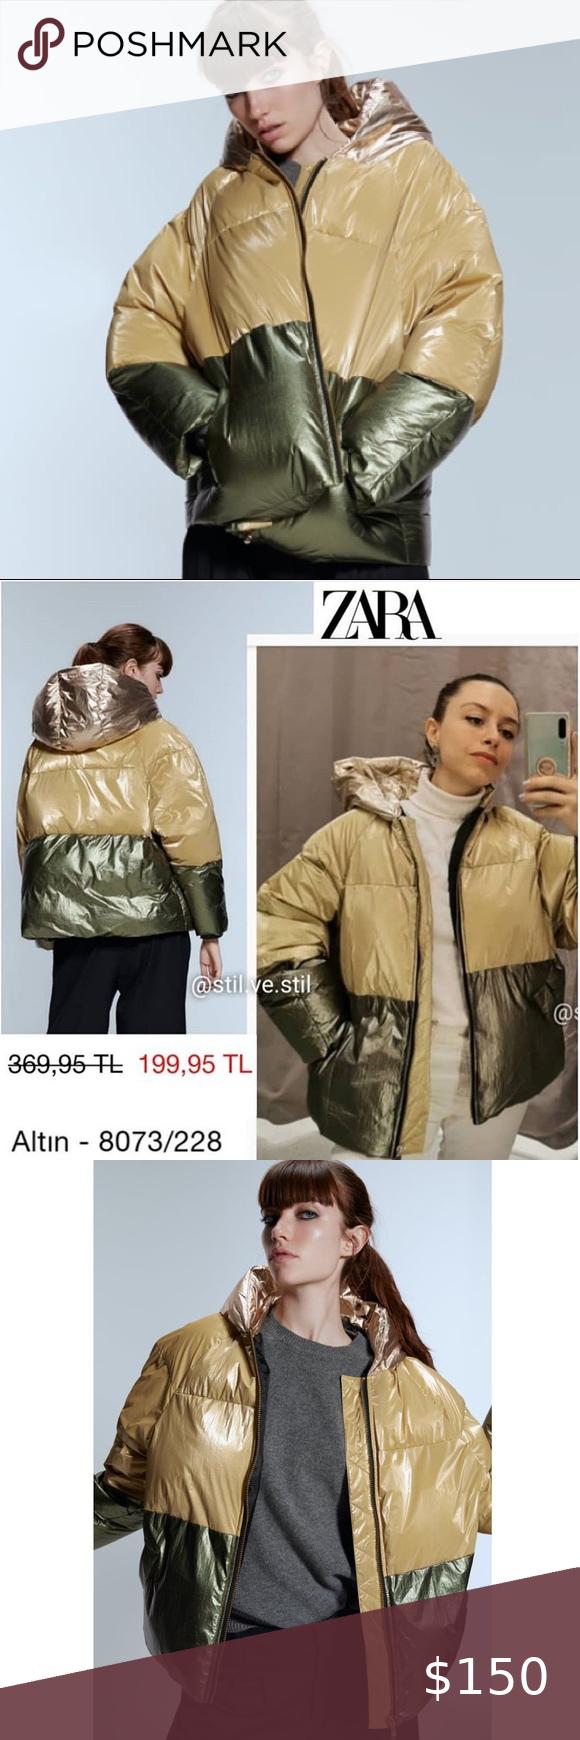 Nwt Zara Color Block Green Gold Puffer Jacket L Coats Jackets Women Zara Long Puffer Coat [ 1740 x 580 Pixel ]